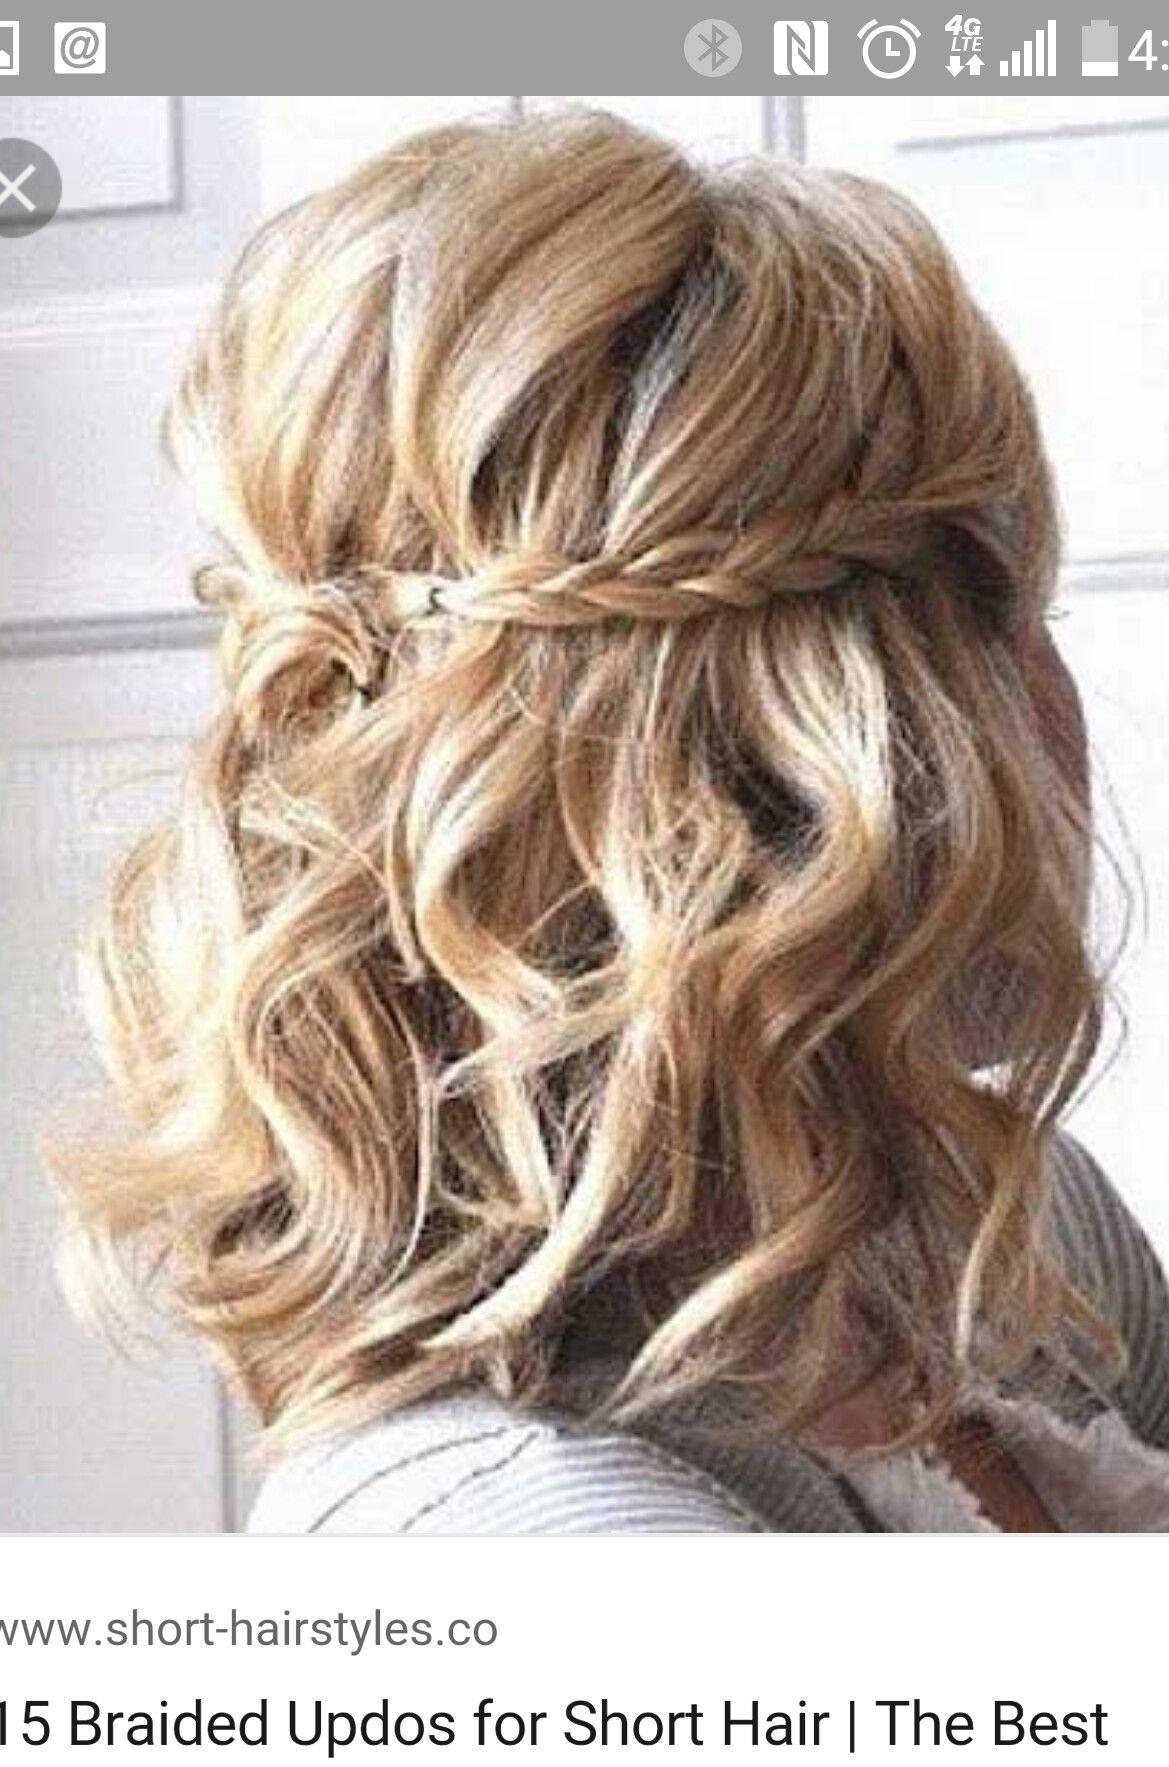 Pin by jillian gallogly on hair pinterest hair style bridesmaid